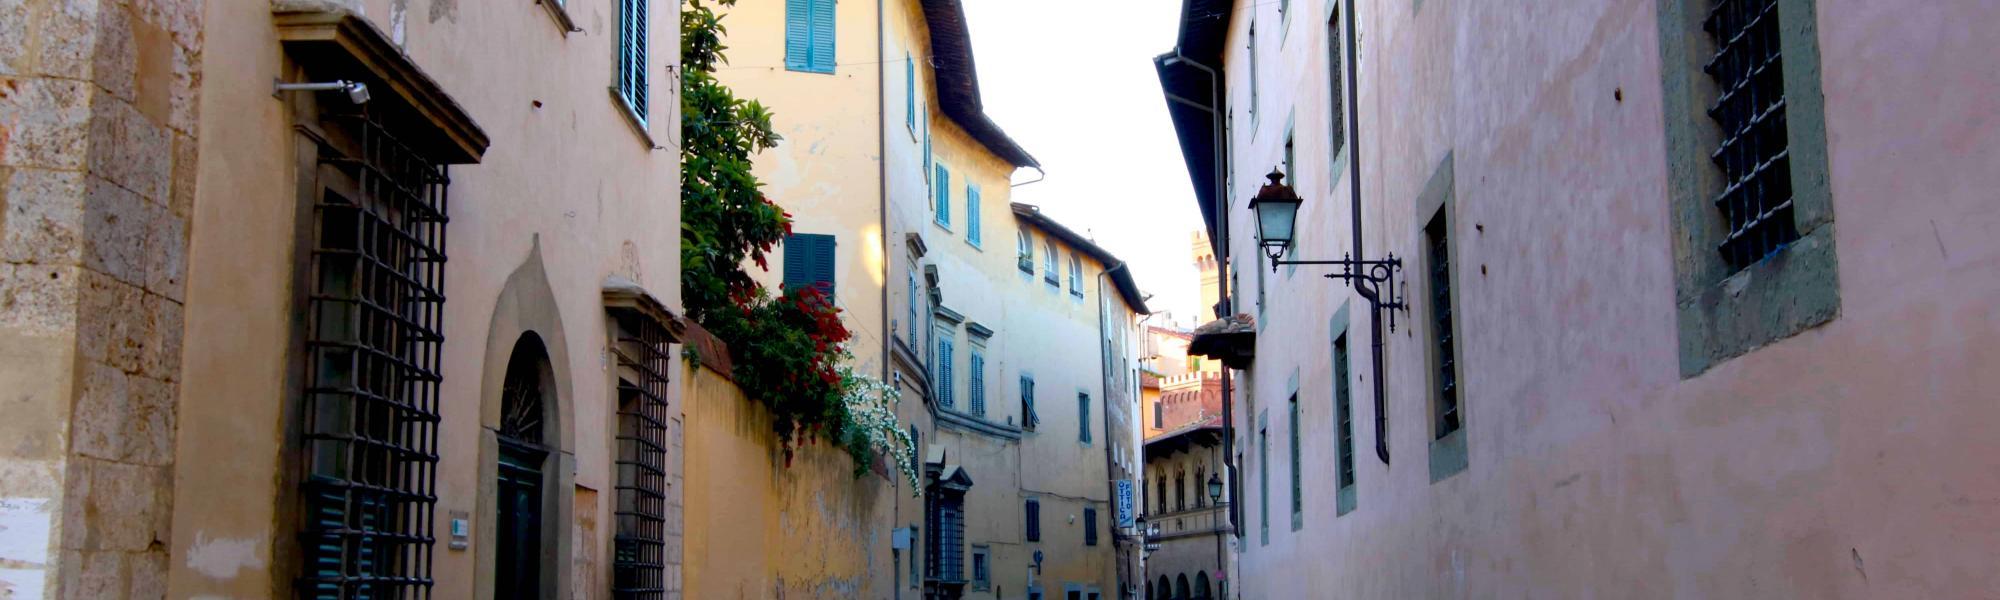 Via Ulisse Dini (A. Matteucci)